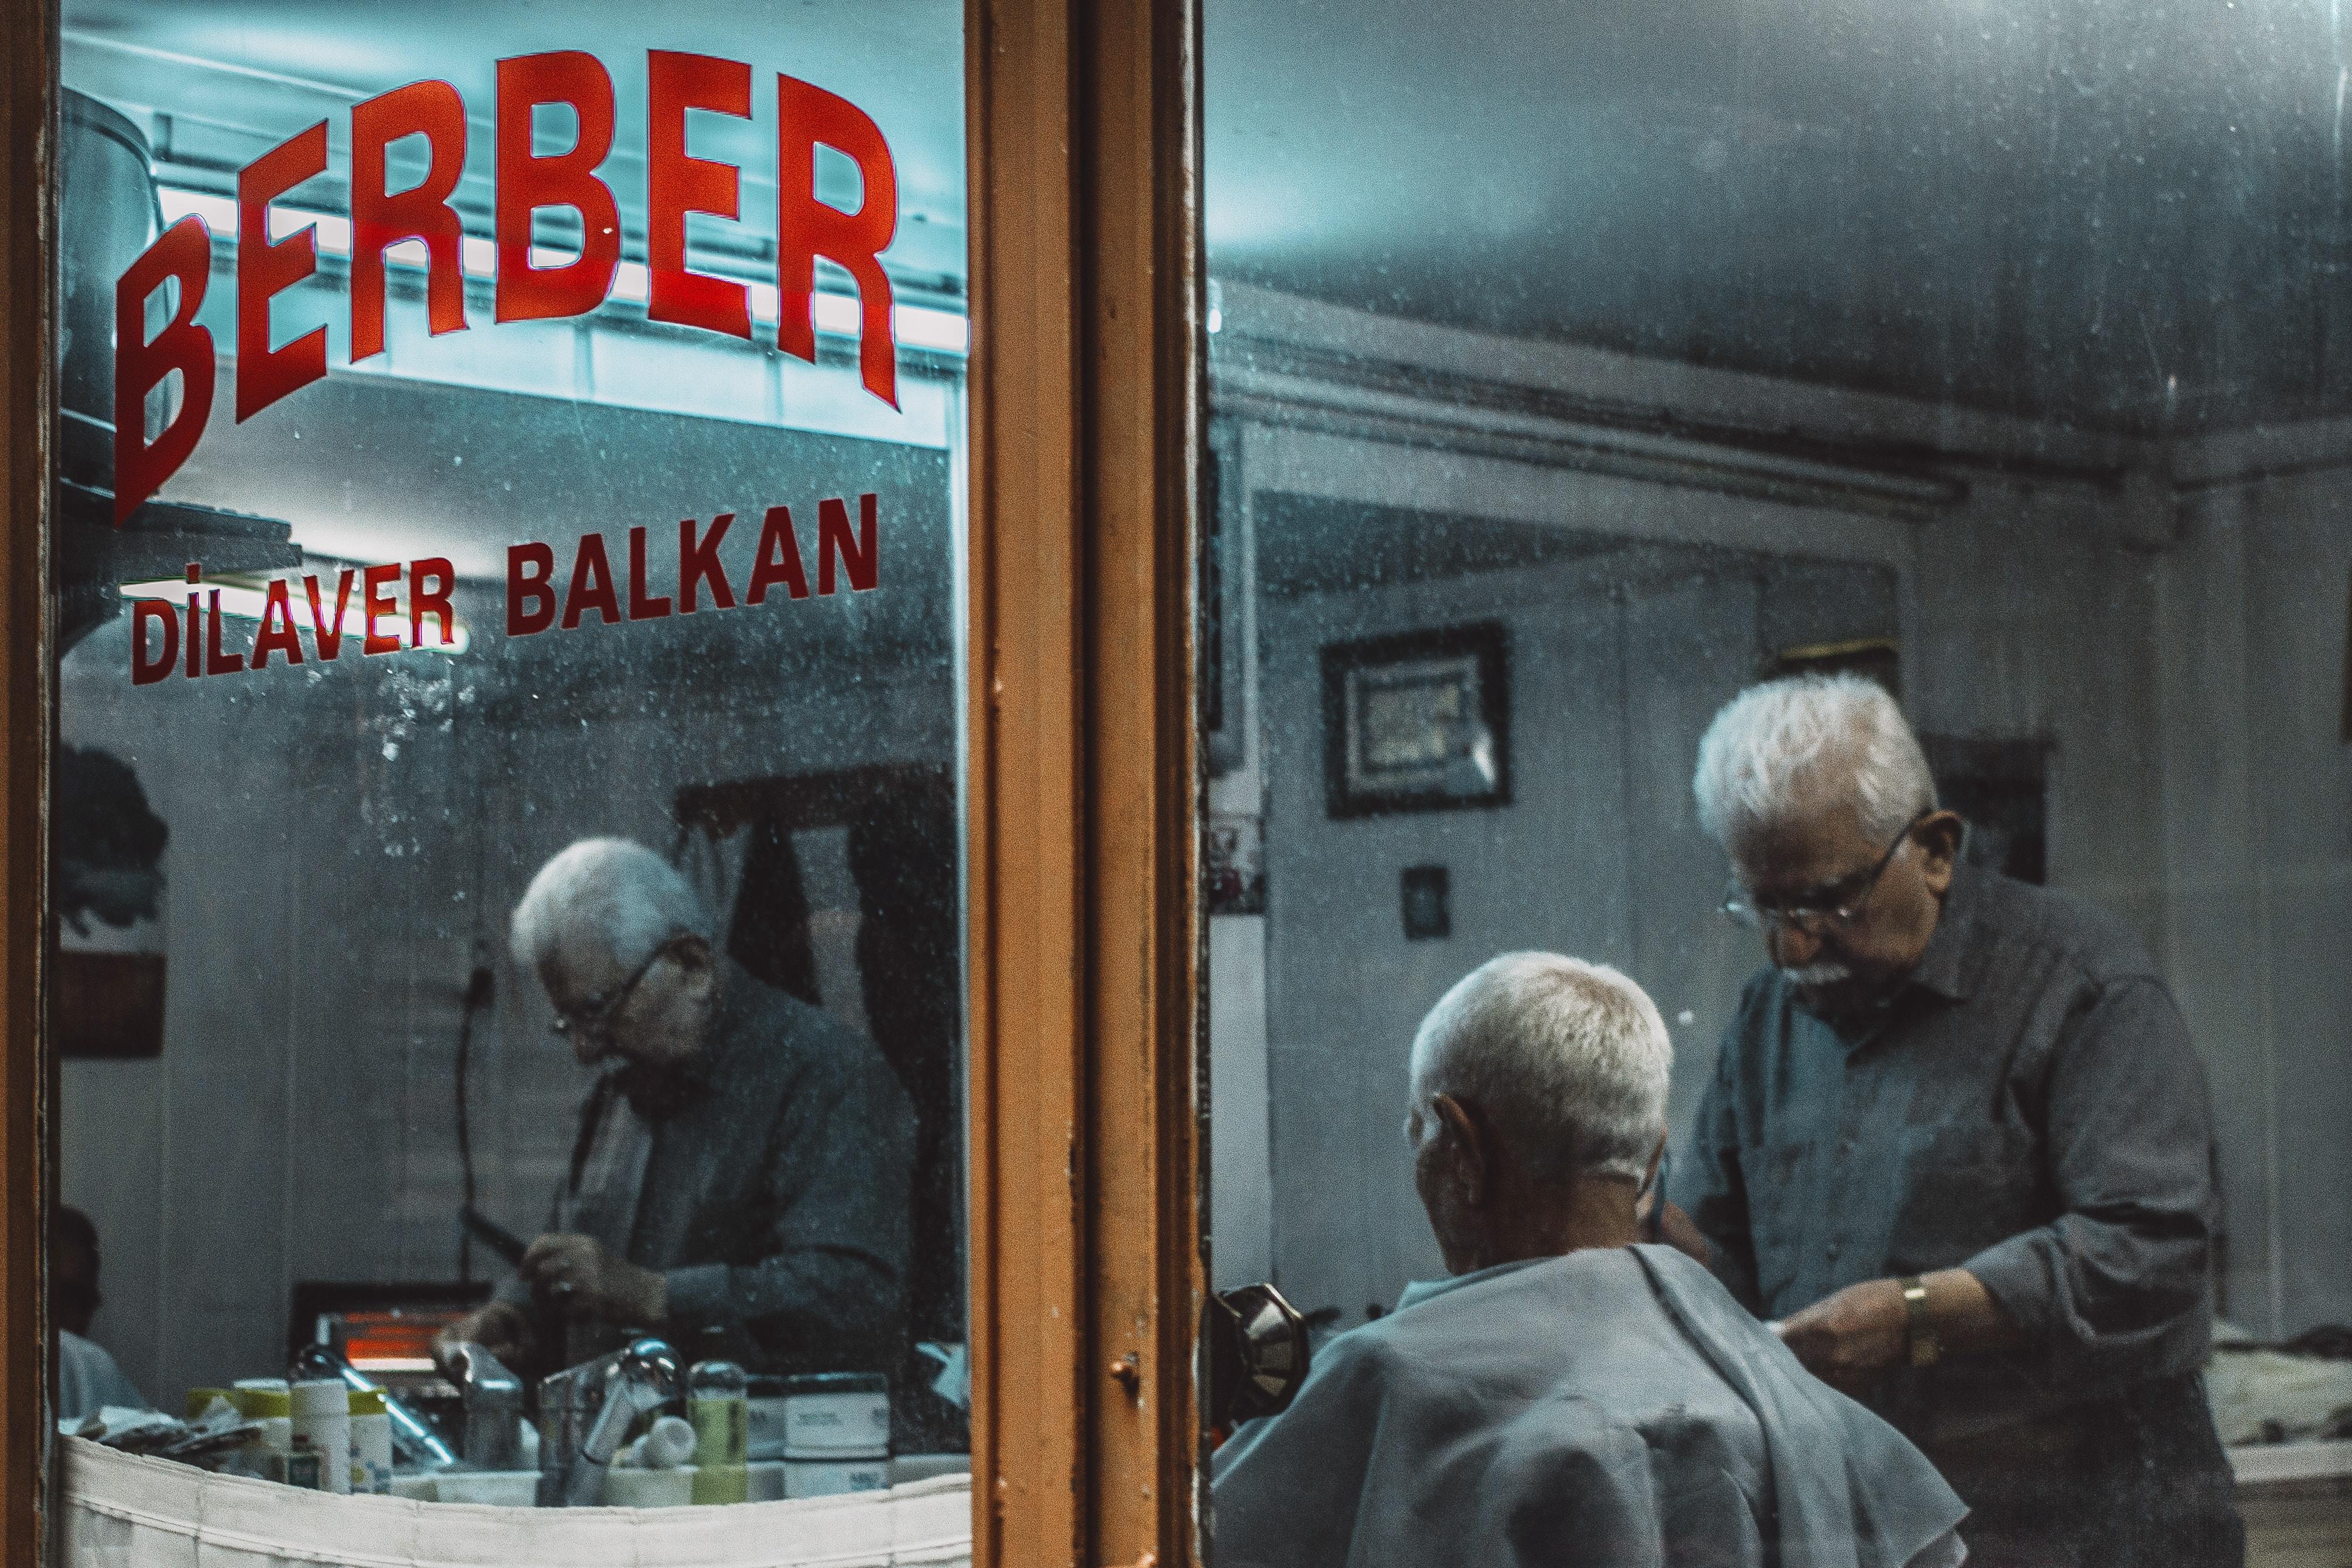 Older man working as barber